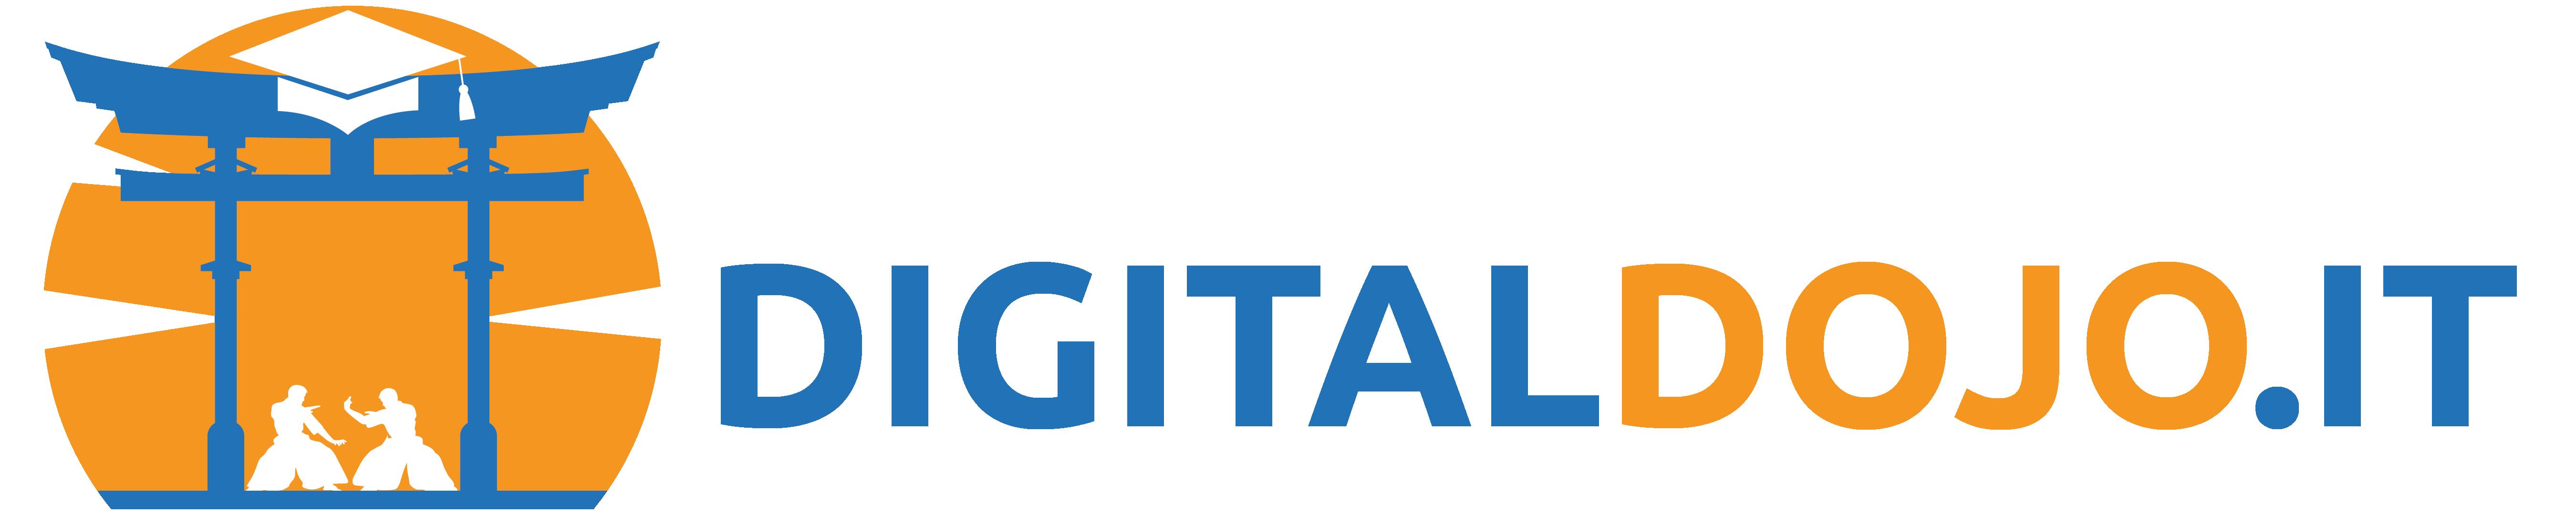 Lavori Digitali